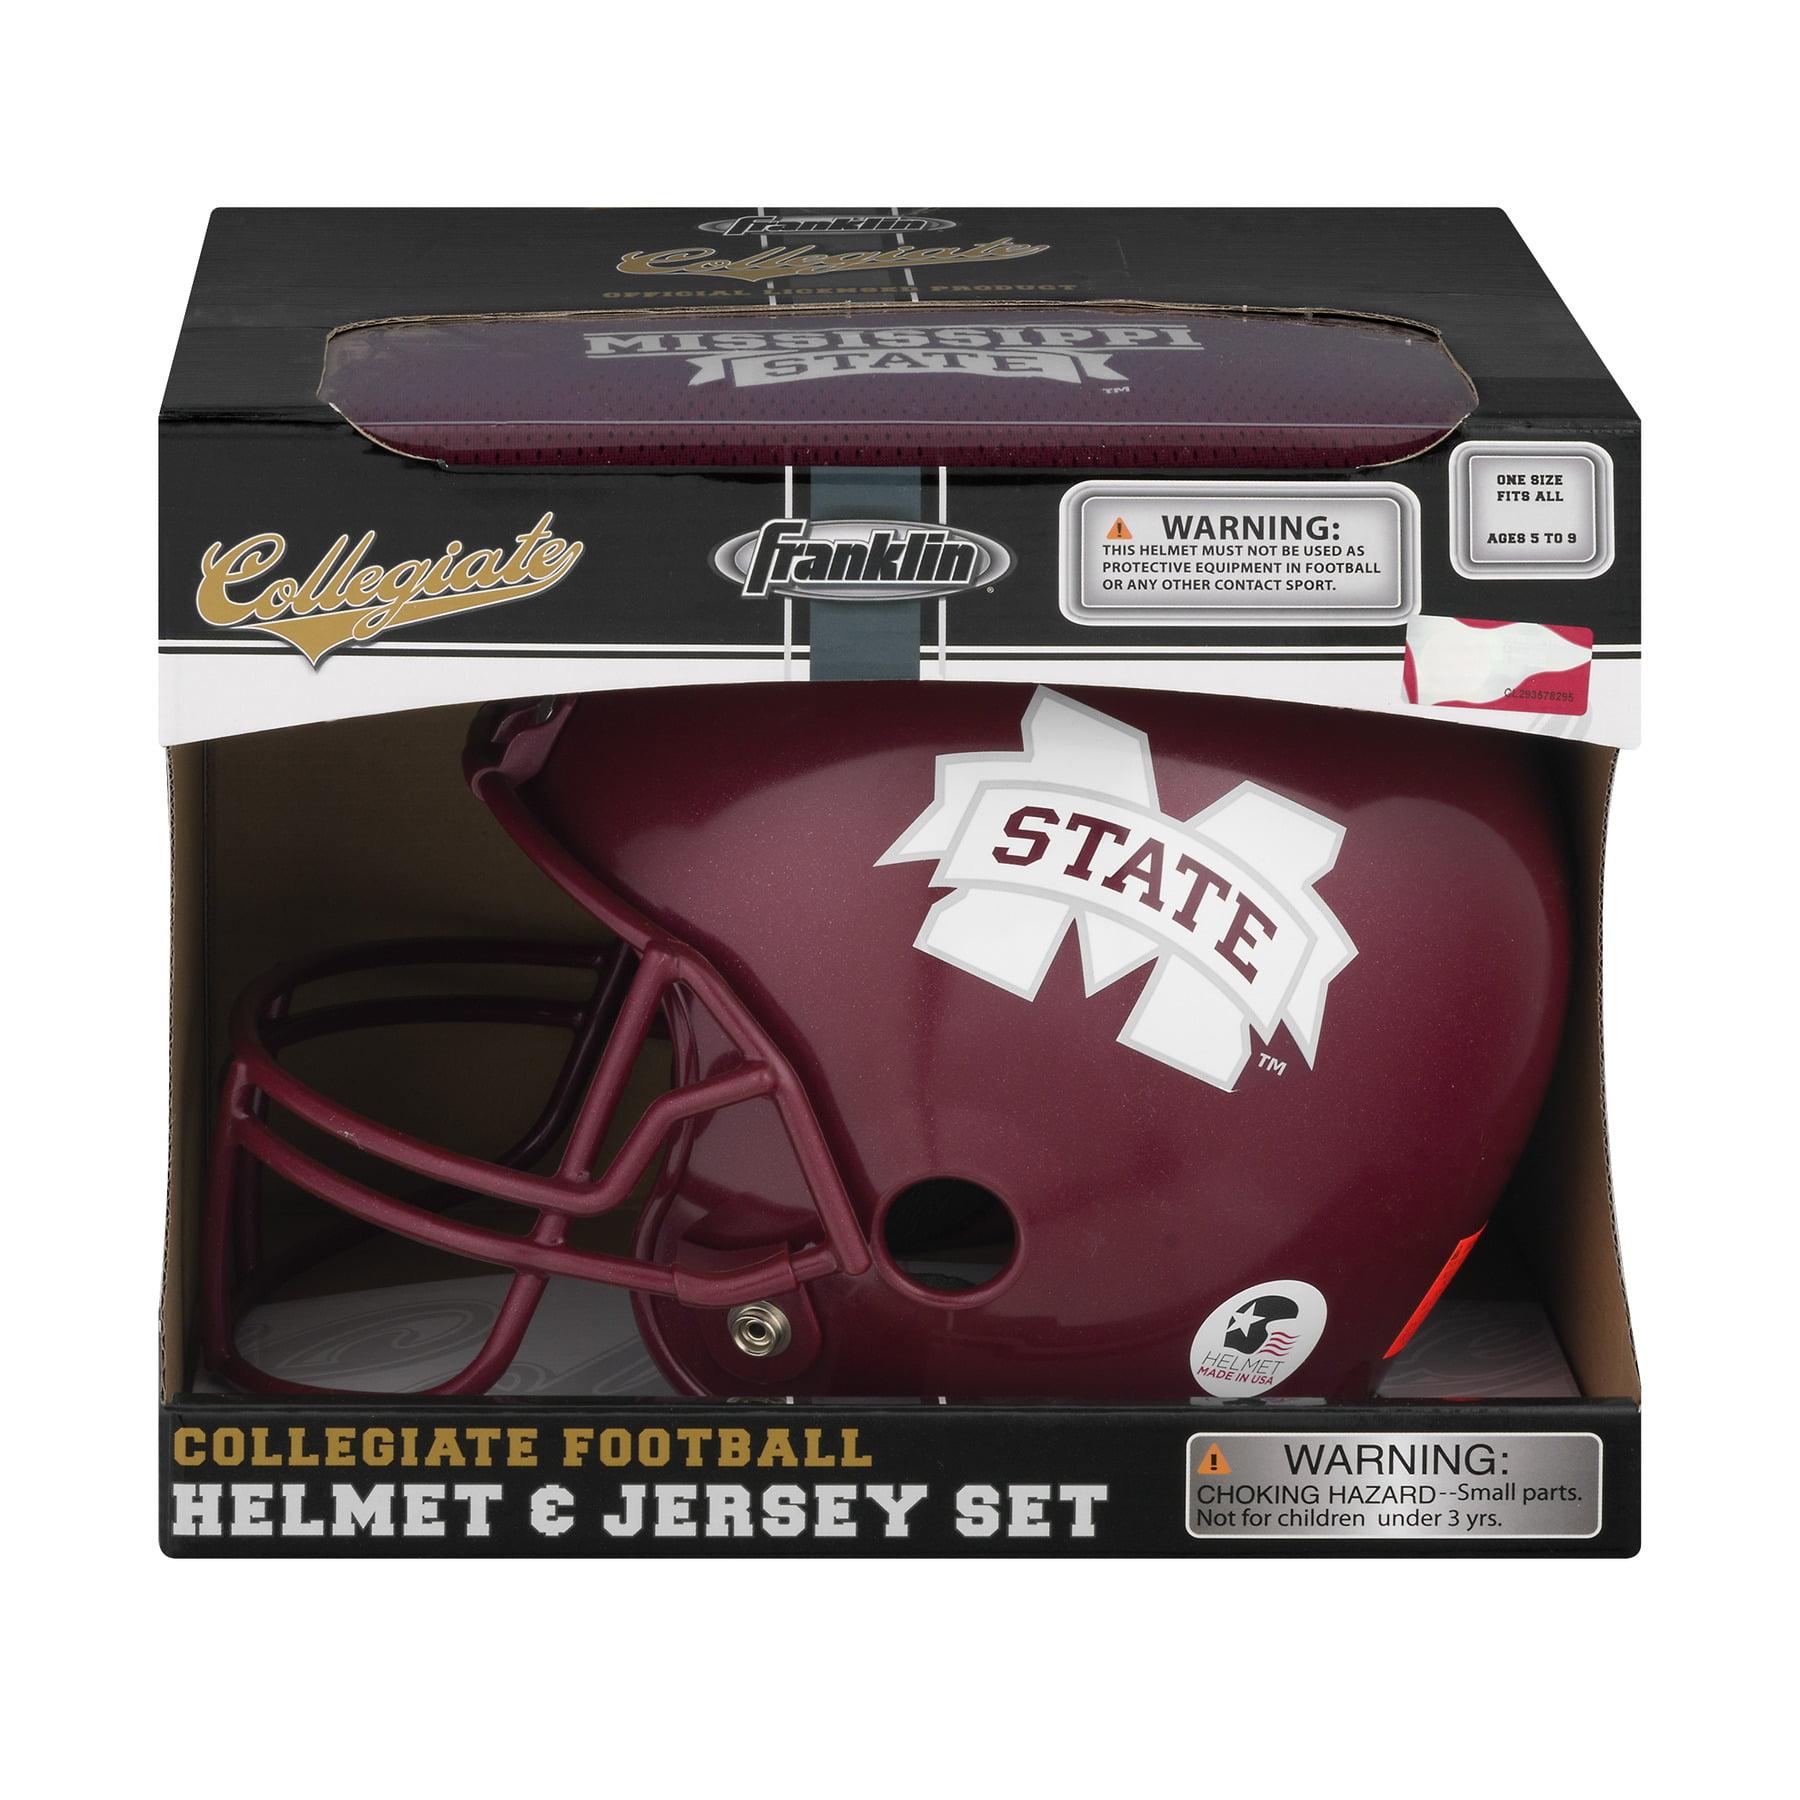 Franklin Collegiate Football Helmet & Jersey Set Mississippi State, 1.0 CT